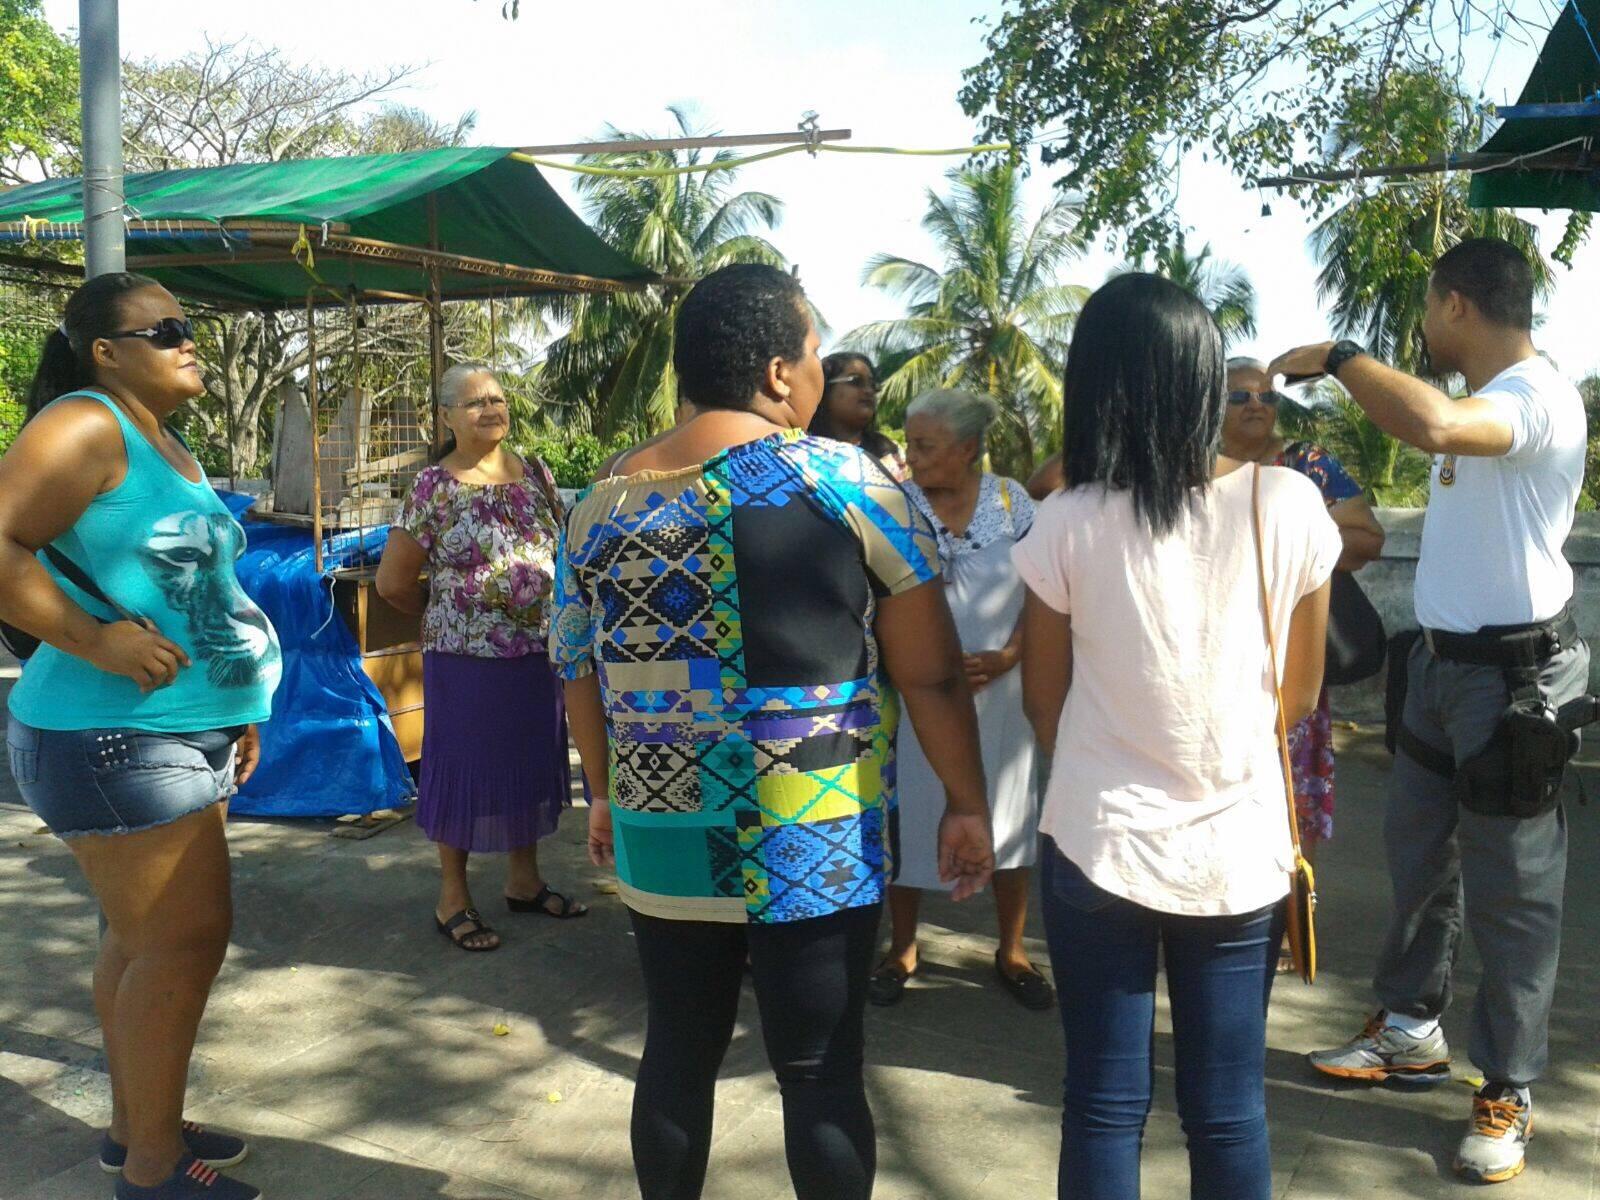 Comunidade Bola na Rede_visita a Olinda_21nov15_foto 1